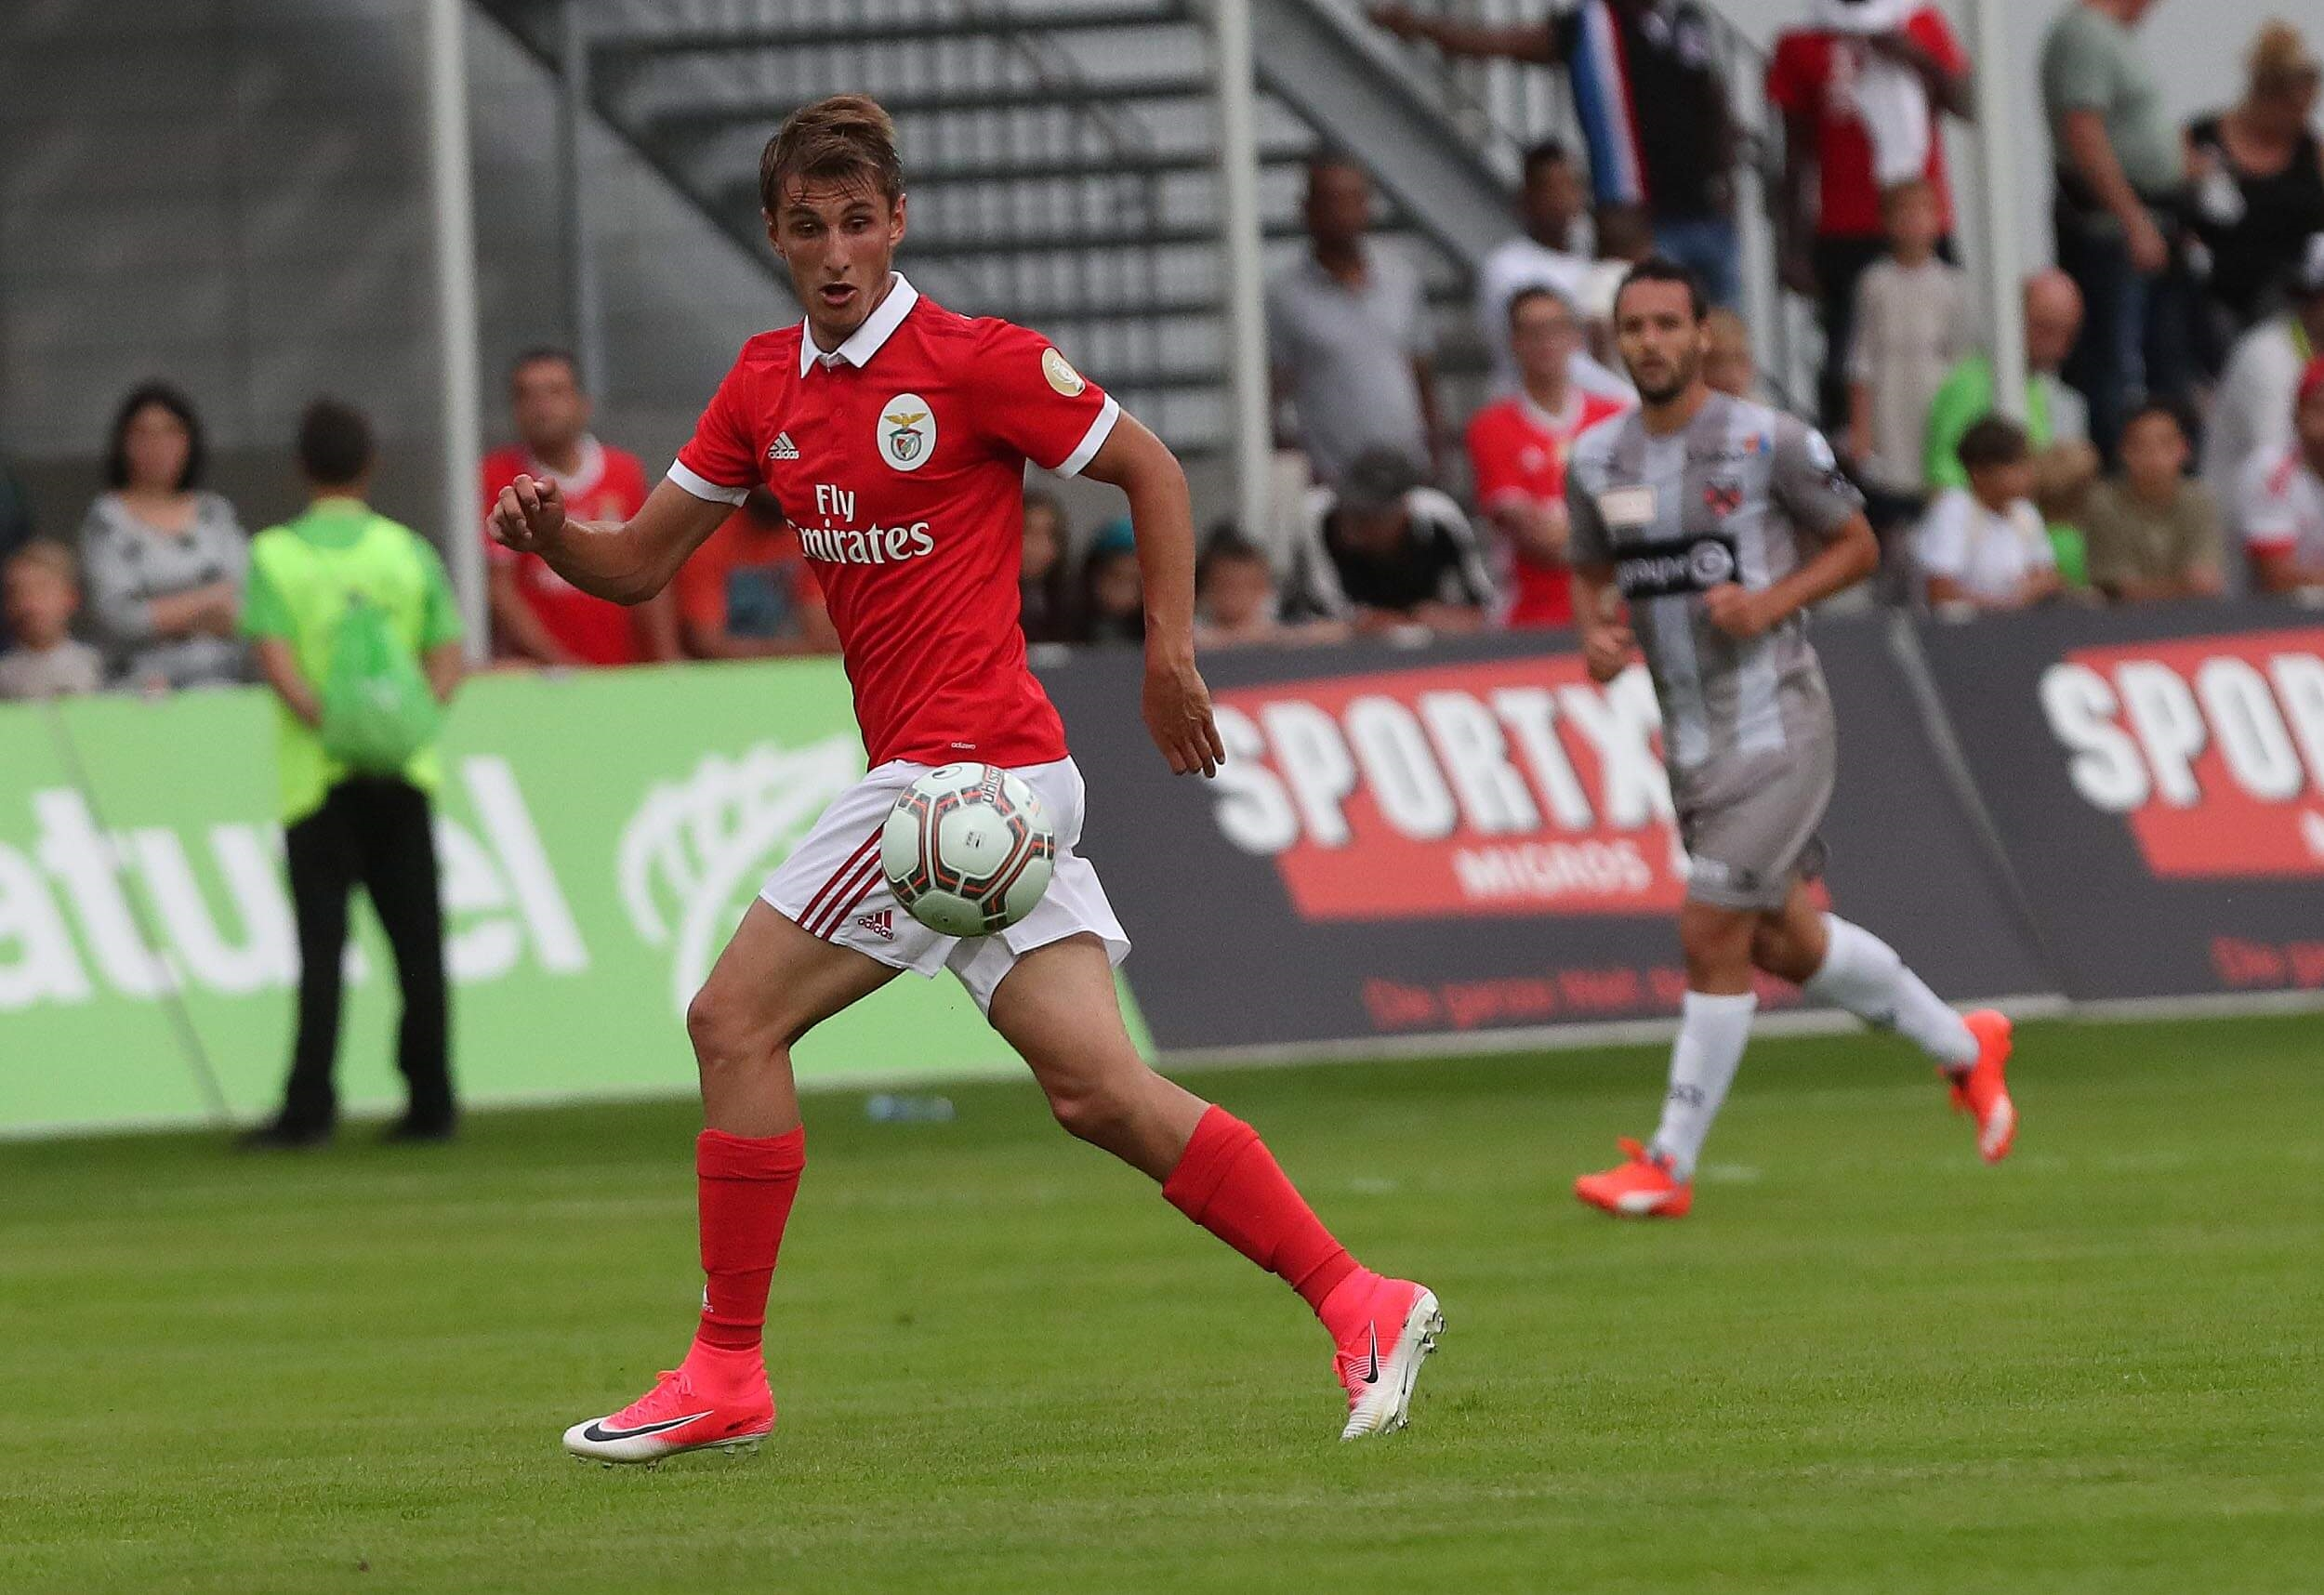 Benfica: Douglas e Gabigol inscritos na LC, Krovinovic e Chrien de fora